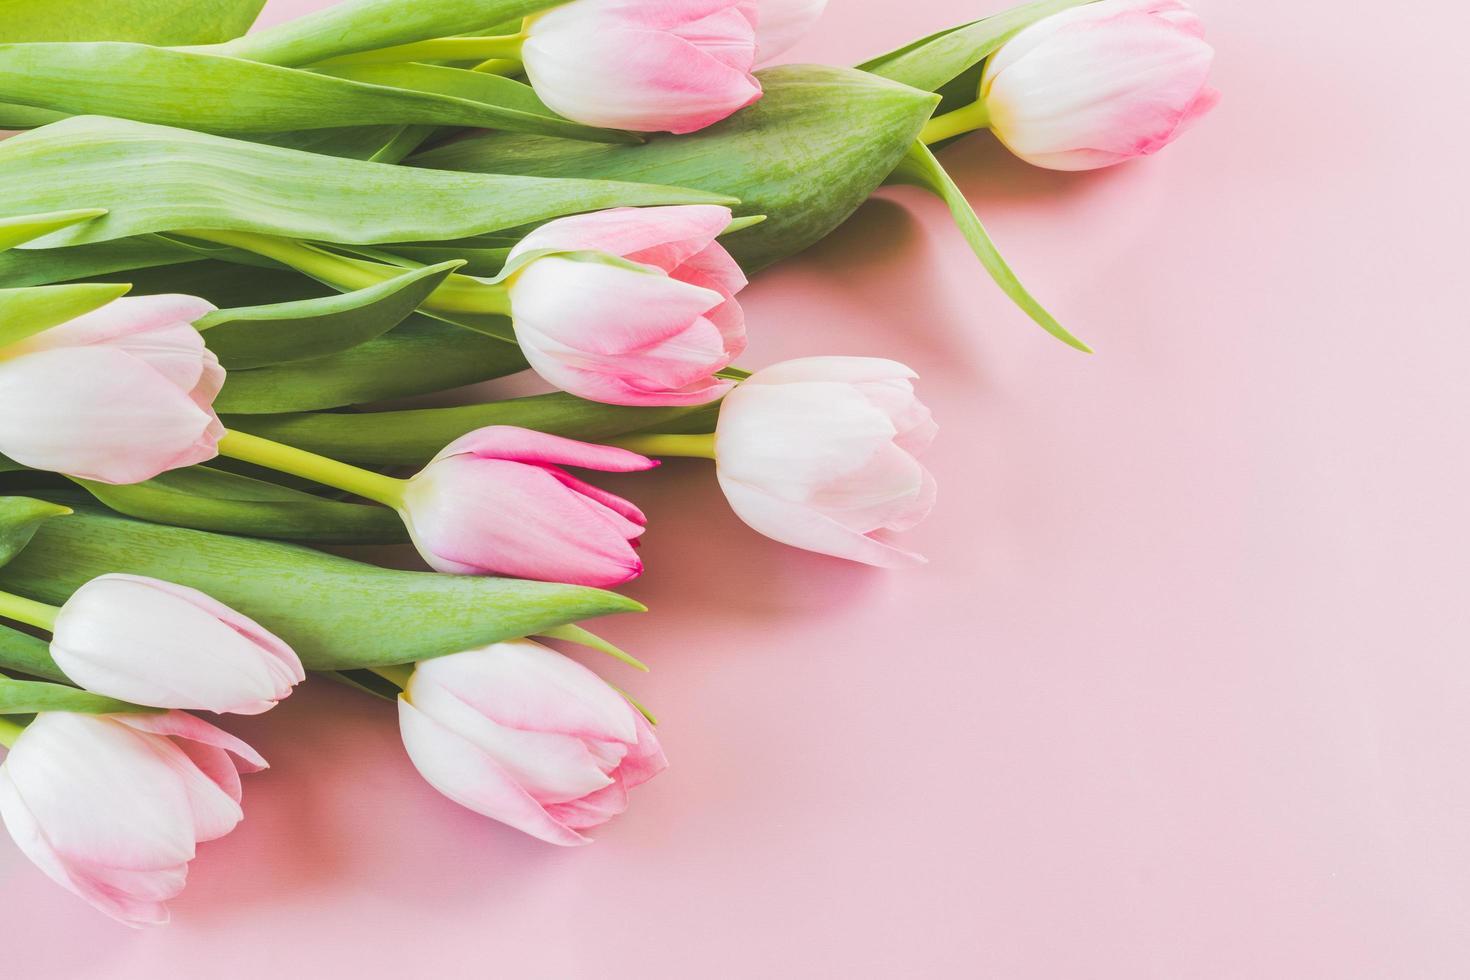 tulipes roses sur fond rose photo